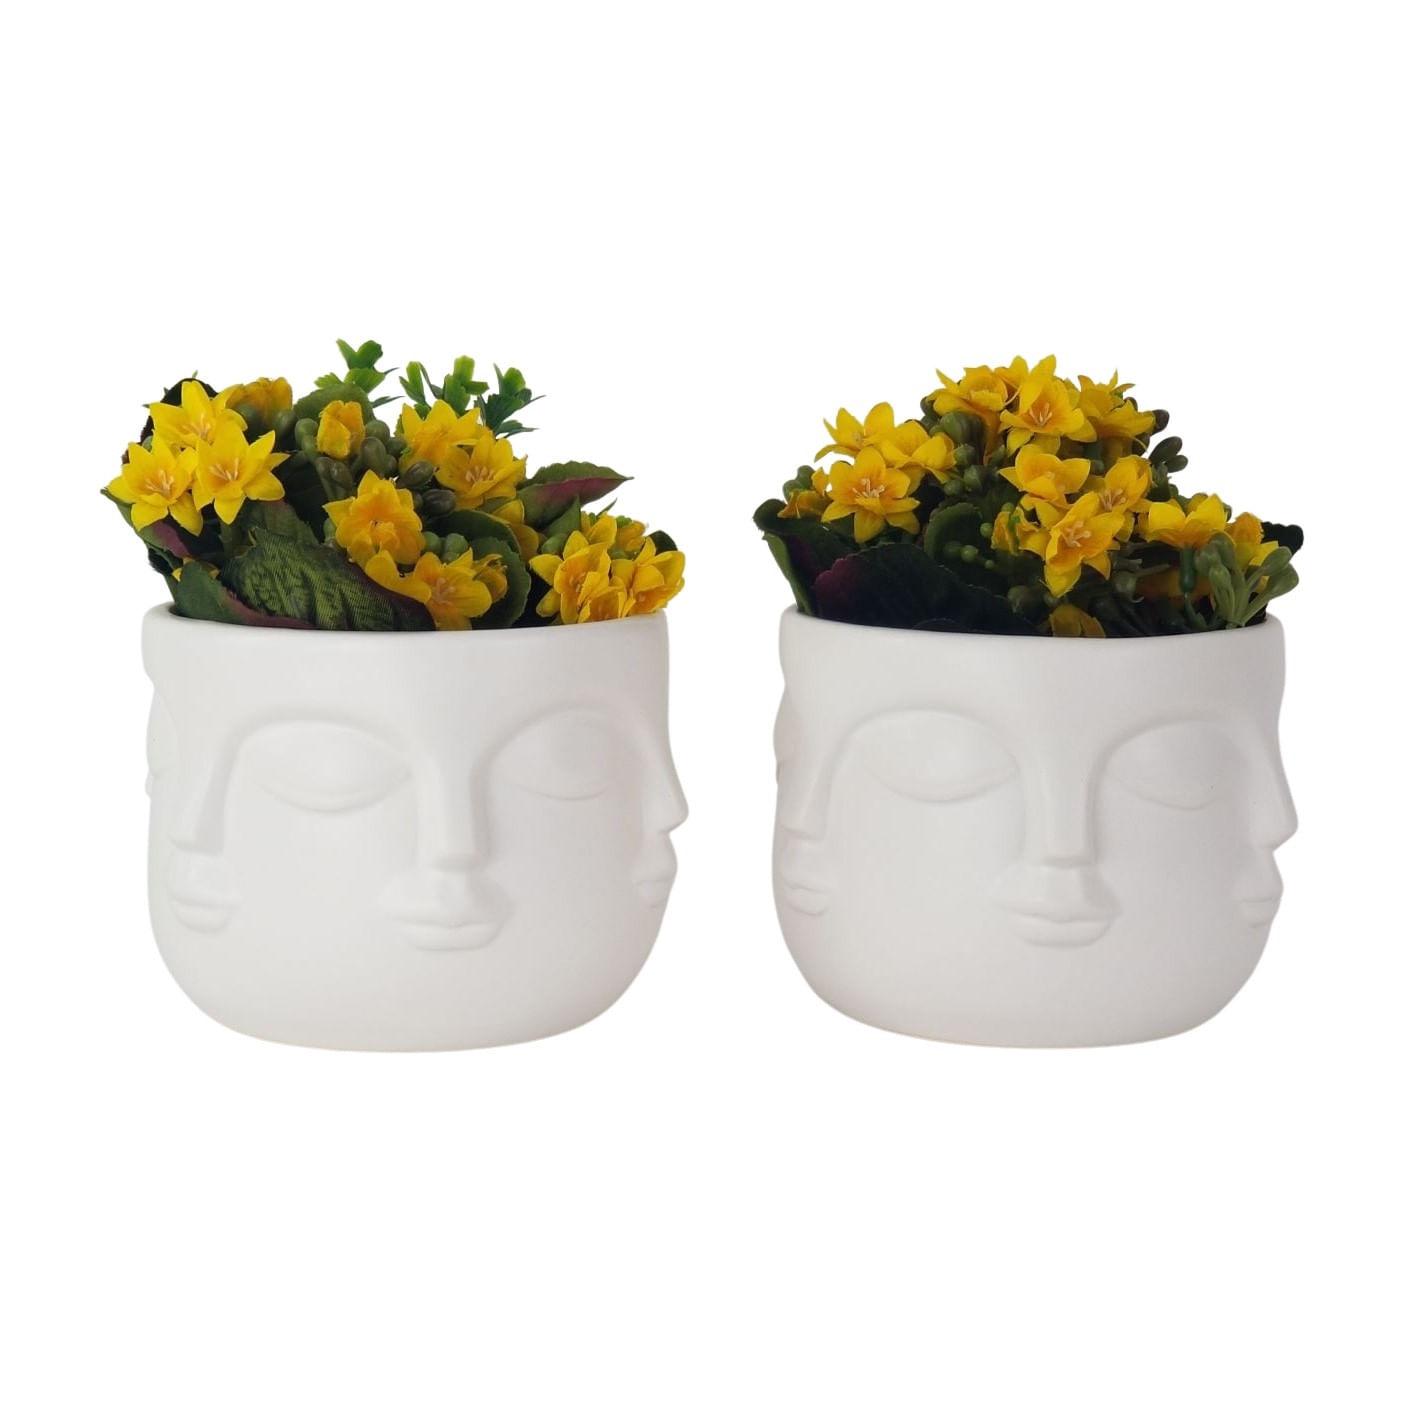 Kit 2 Vasos de Cerâmica Rostos Brancos - Vasinhos com Faces